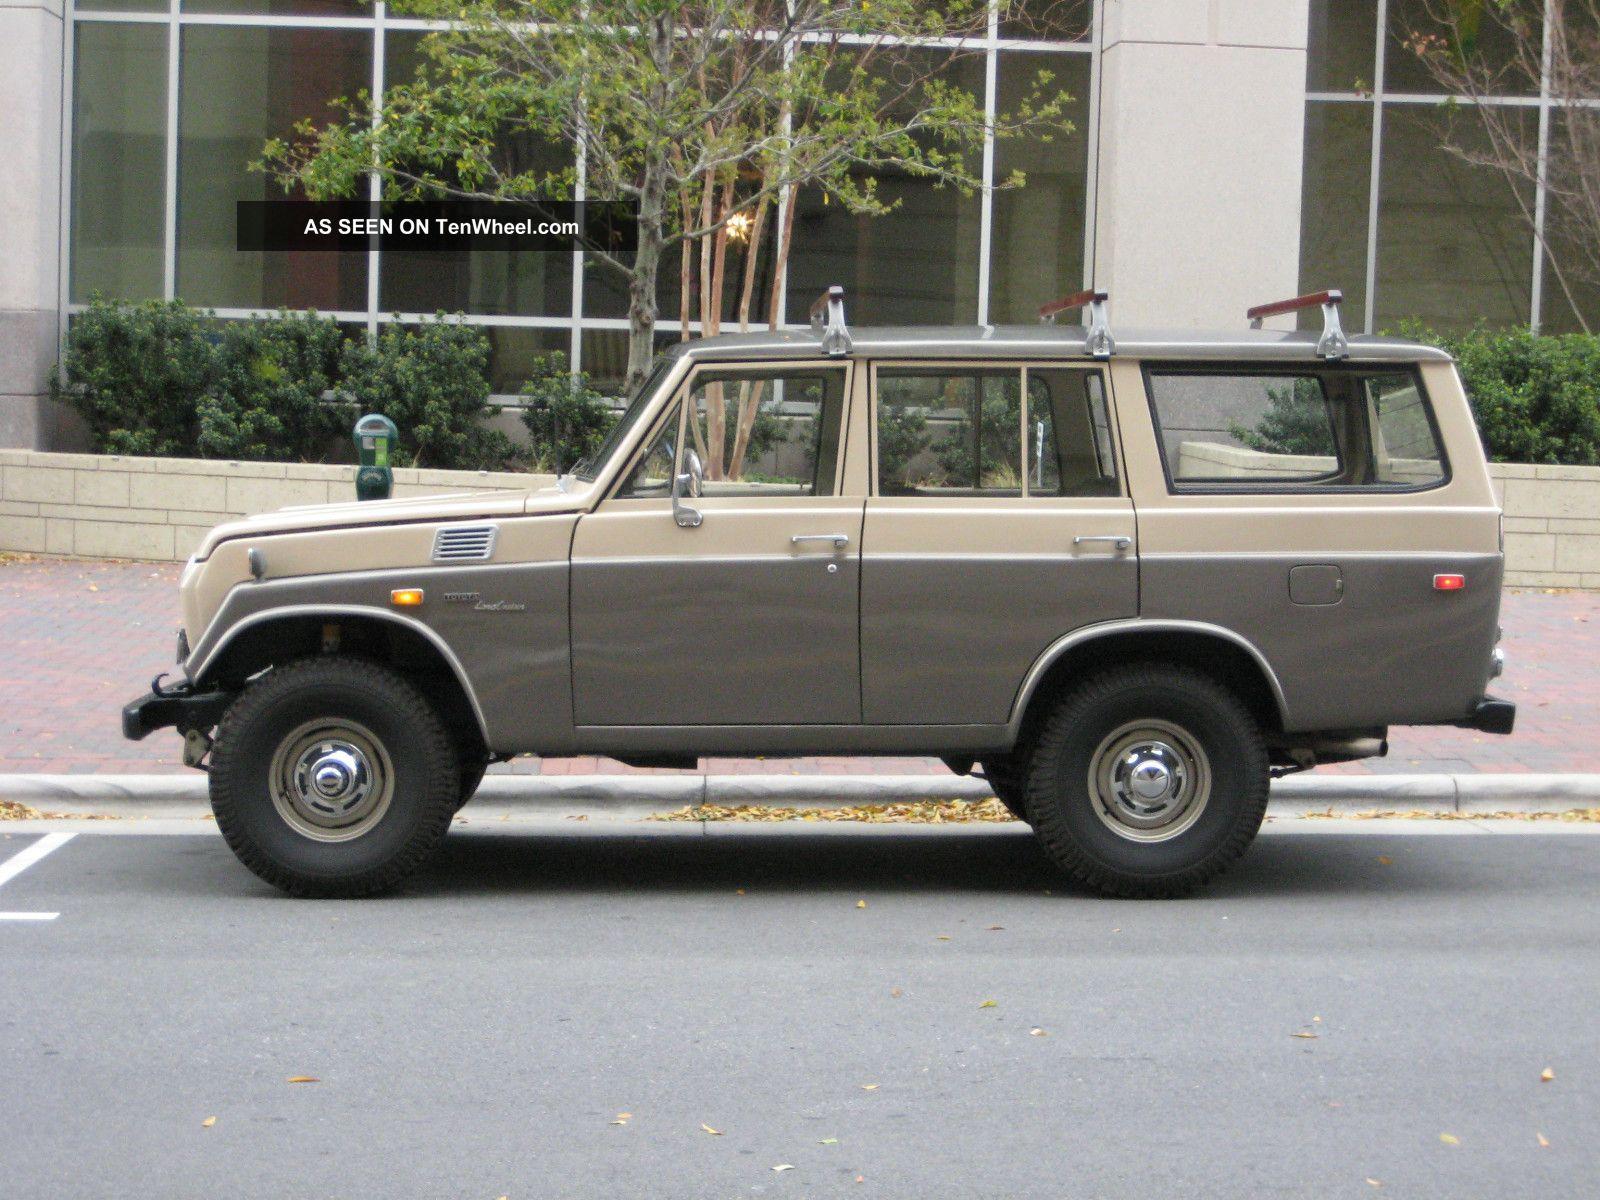 1971 Toyota Land Cruiser Fj55 By Tlc Tlc4x4 Of California